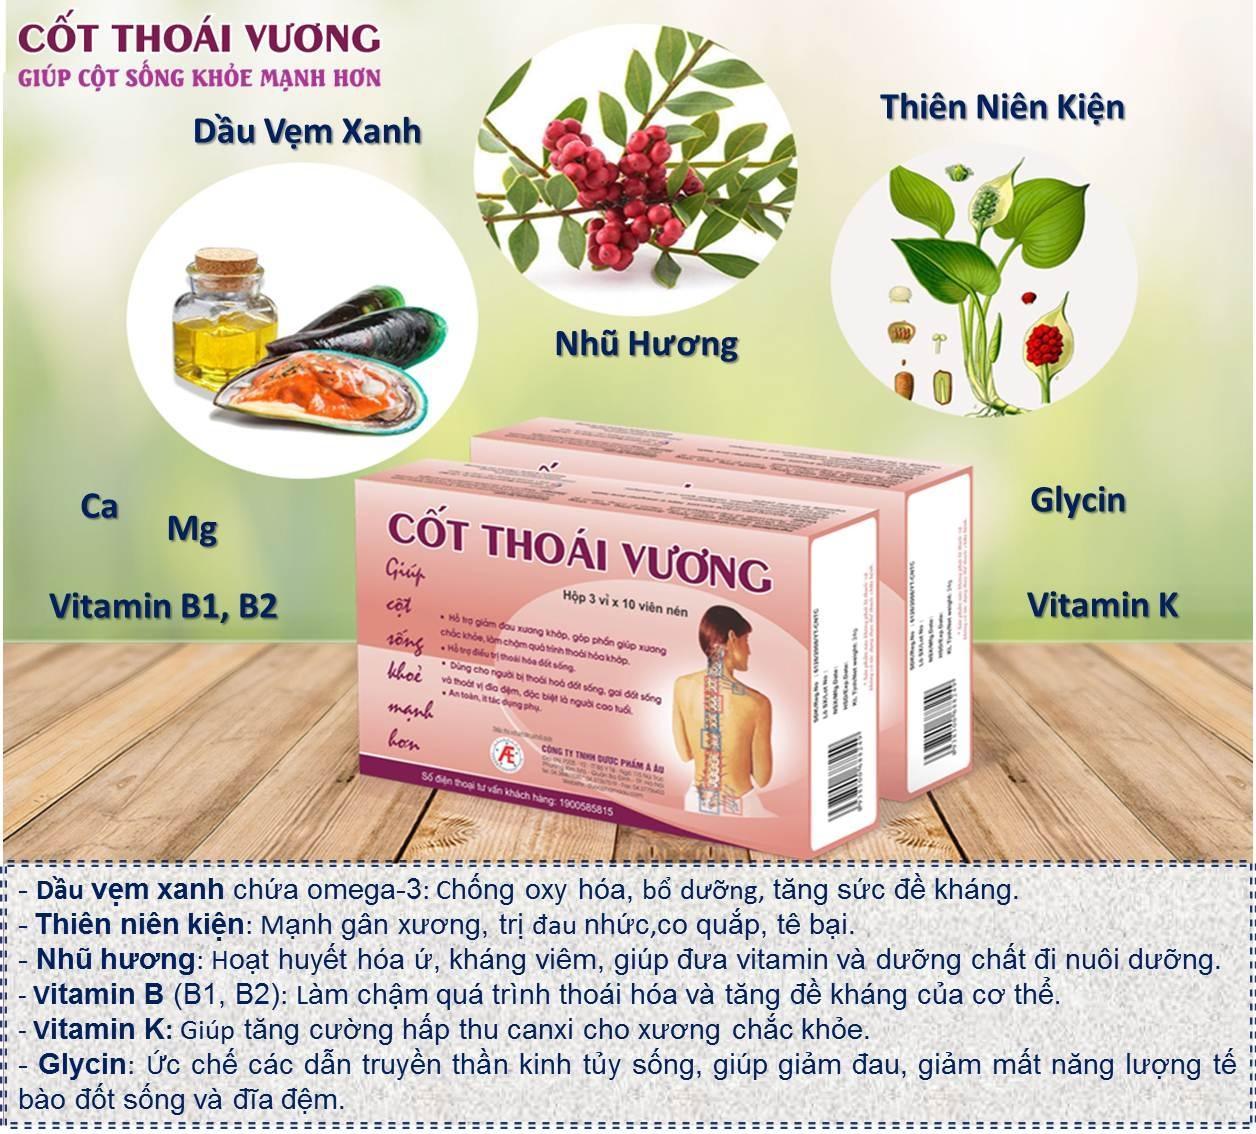 Thanh-phan-cot-thoai-vuong